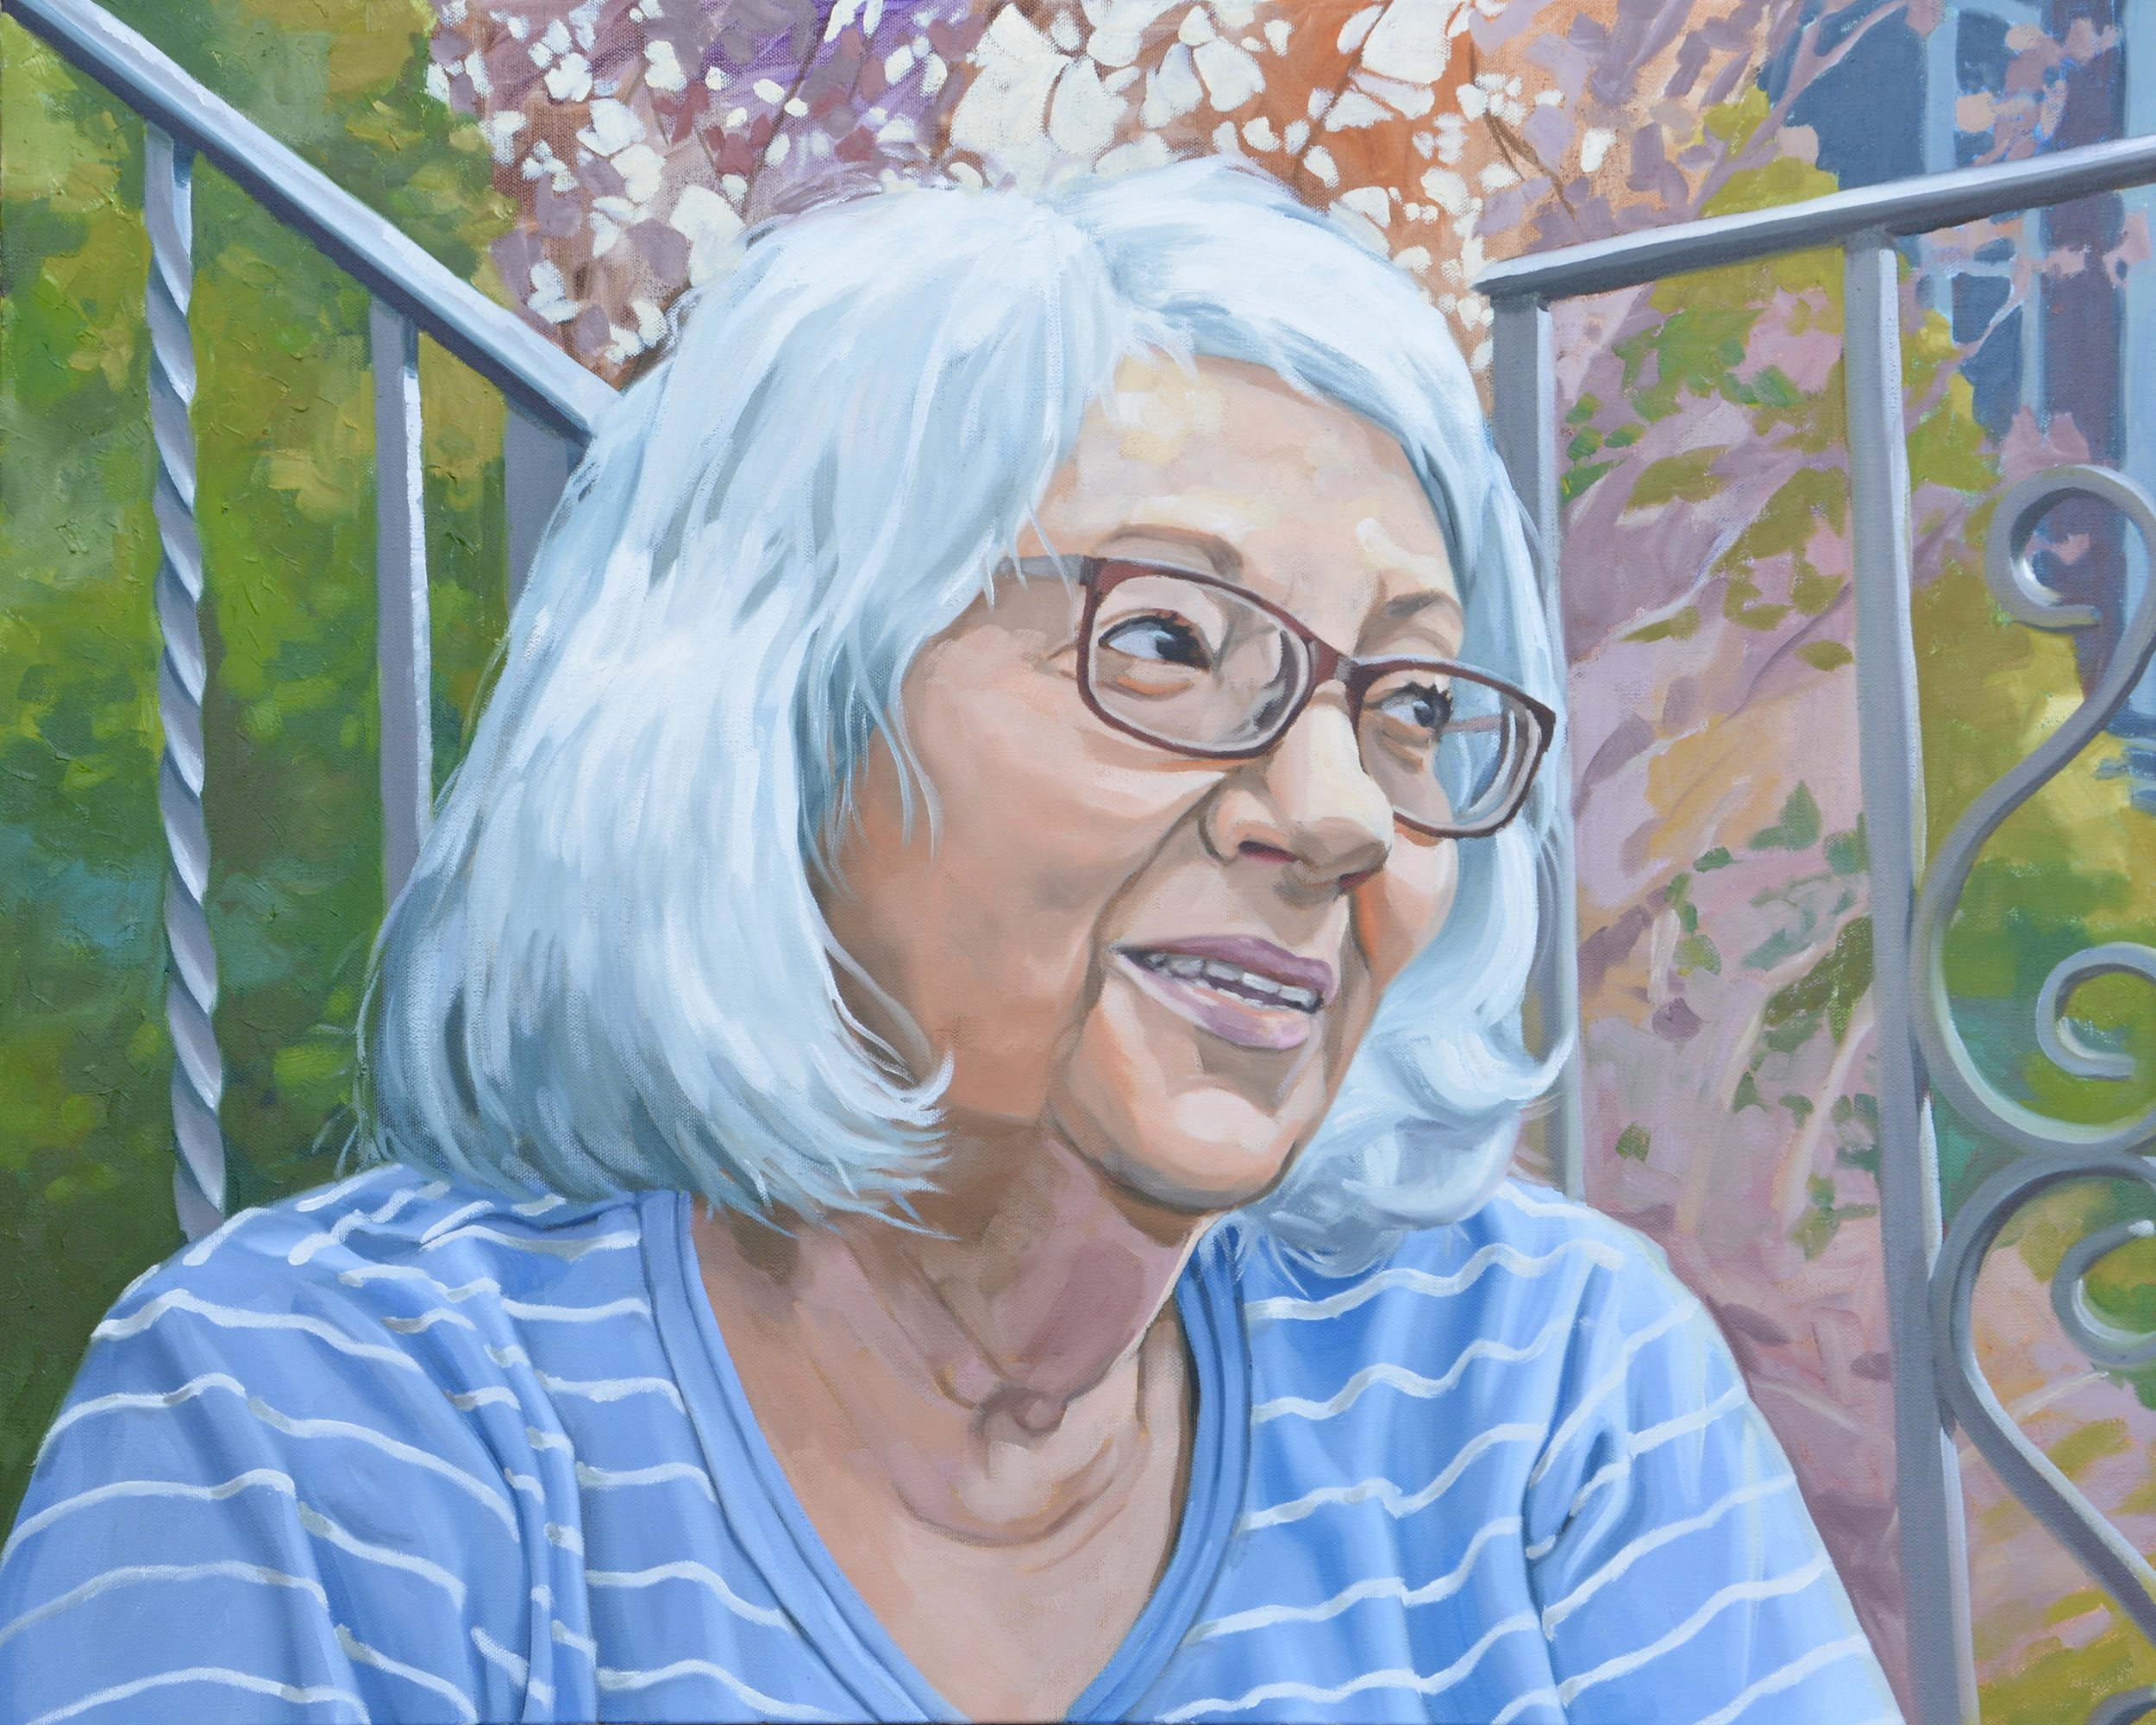 "Copy of Good Neighbors (Karen), 30x24"", oil on canvas, 2017"